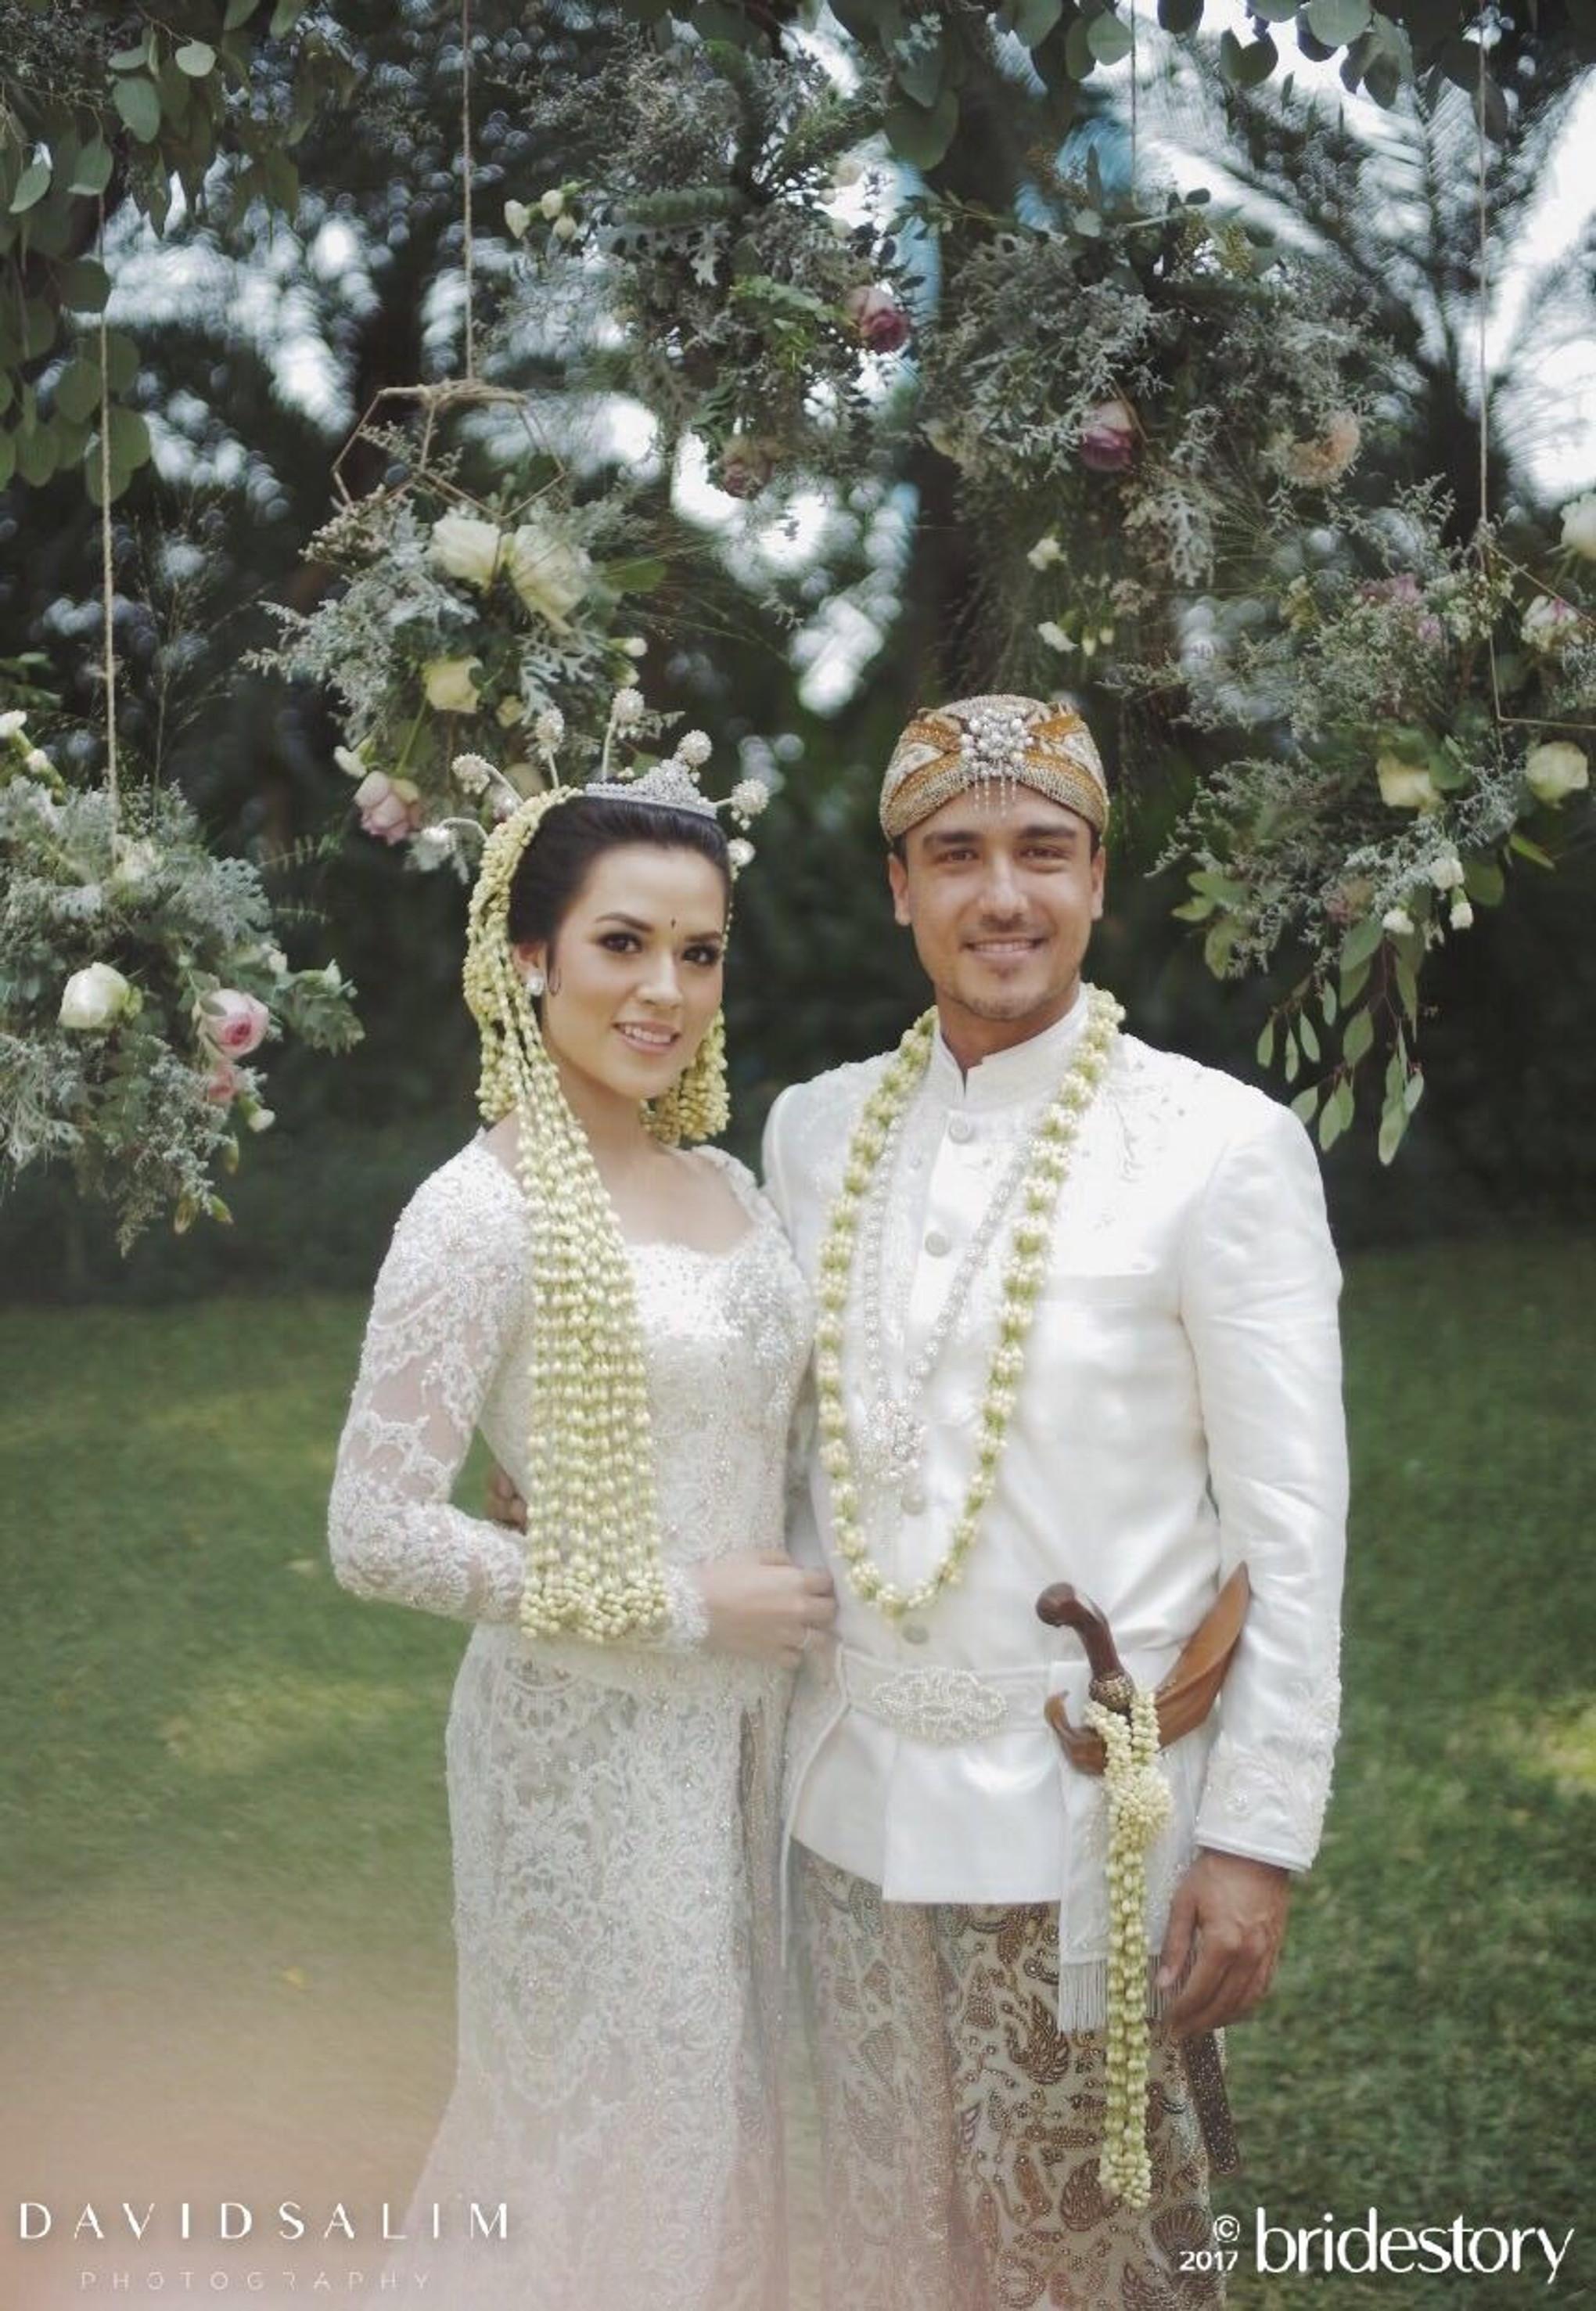 Exclusive! The Wedding of Raisa and Hamish: The Photo Album